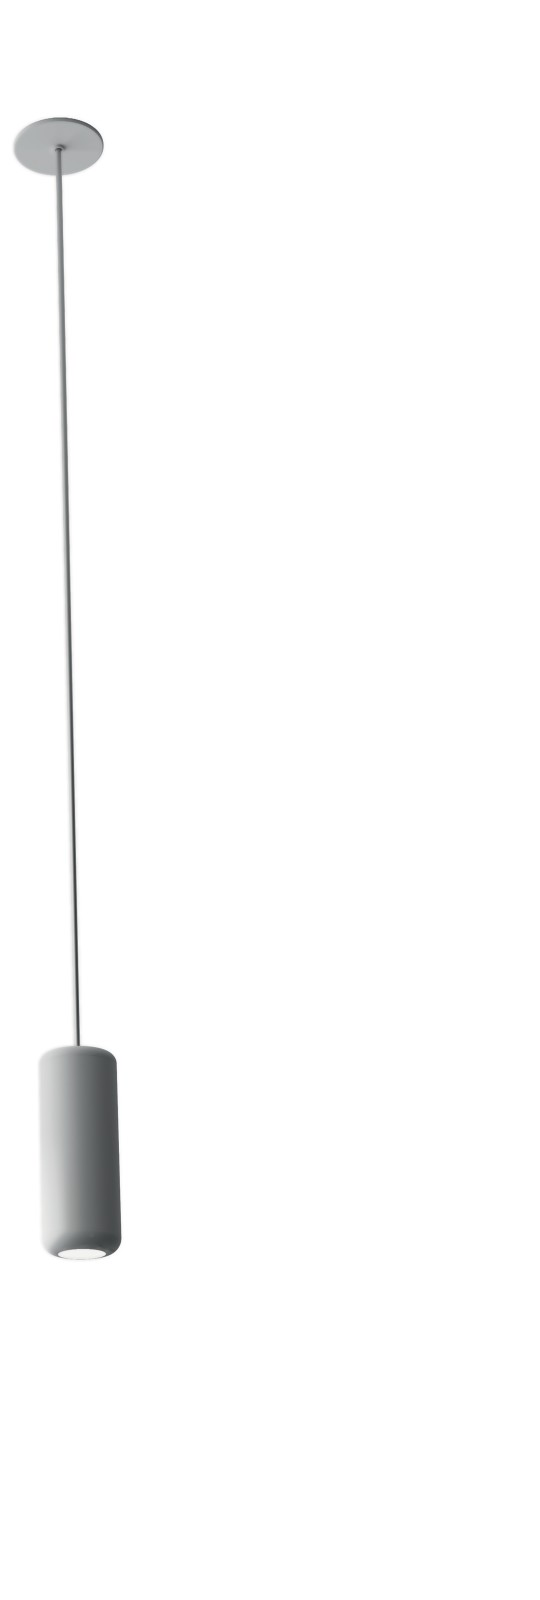 SP Urban Mini (Recessed) Pendant Light Wrinkled White